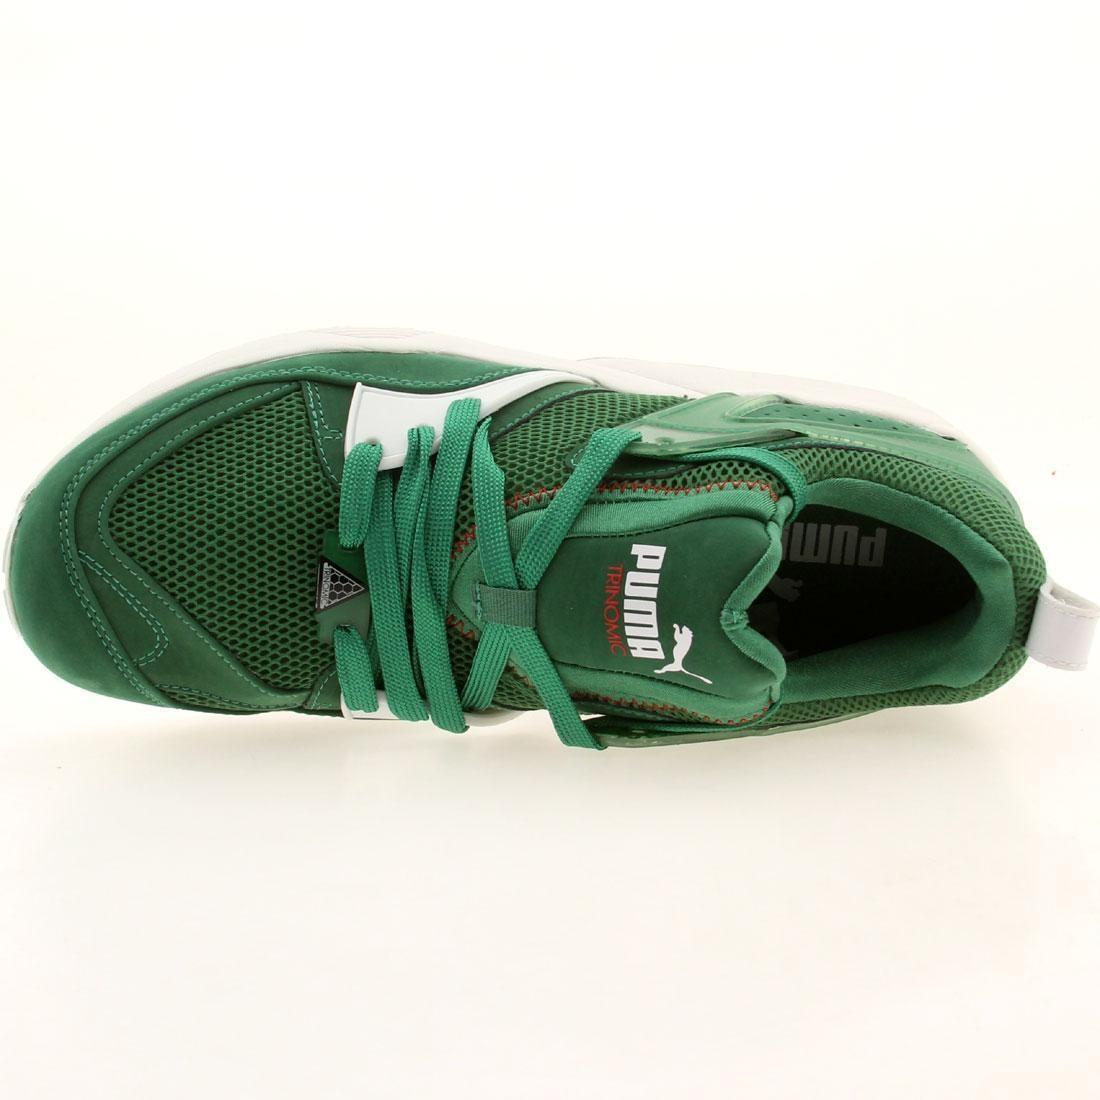 37ecc515256 puma blaze of glory green men on sale   OFF56% Discounts